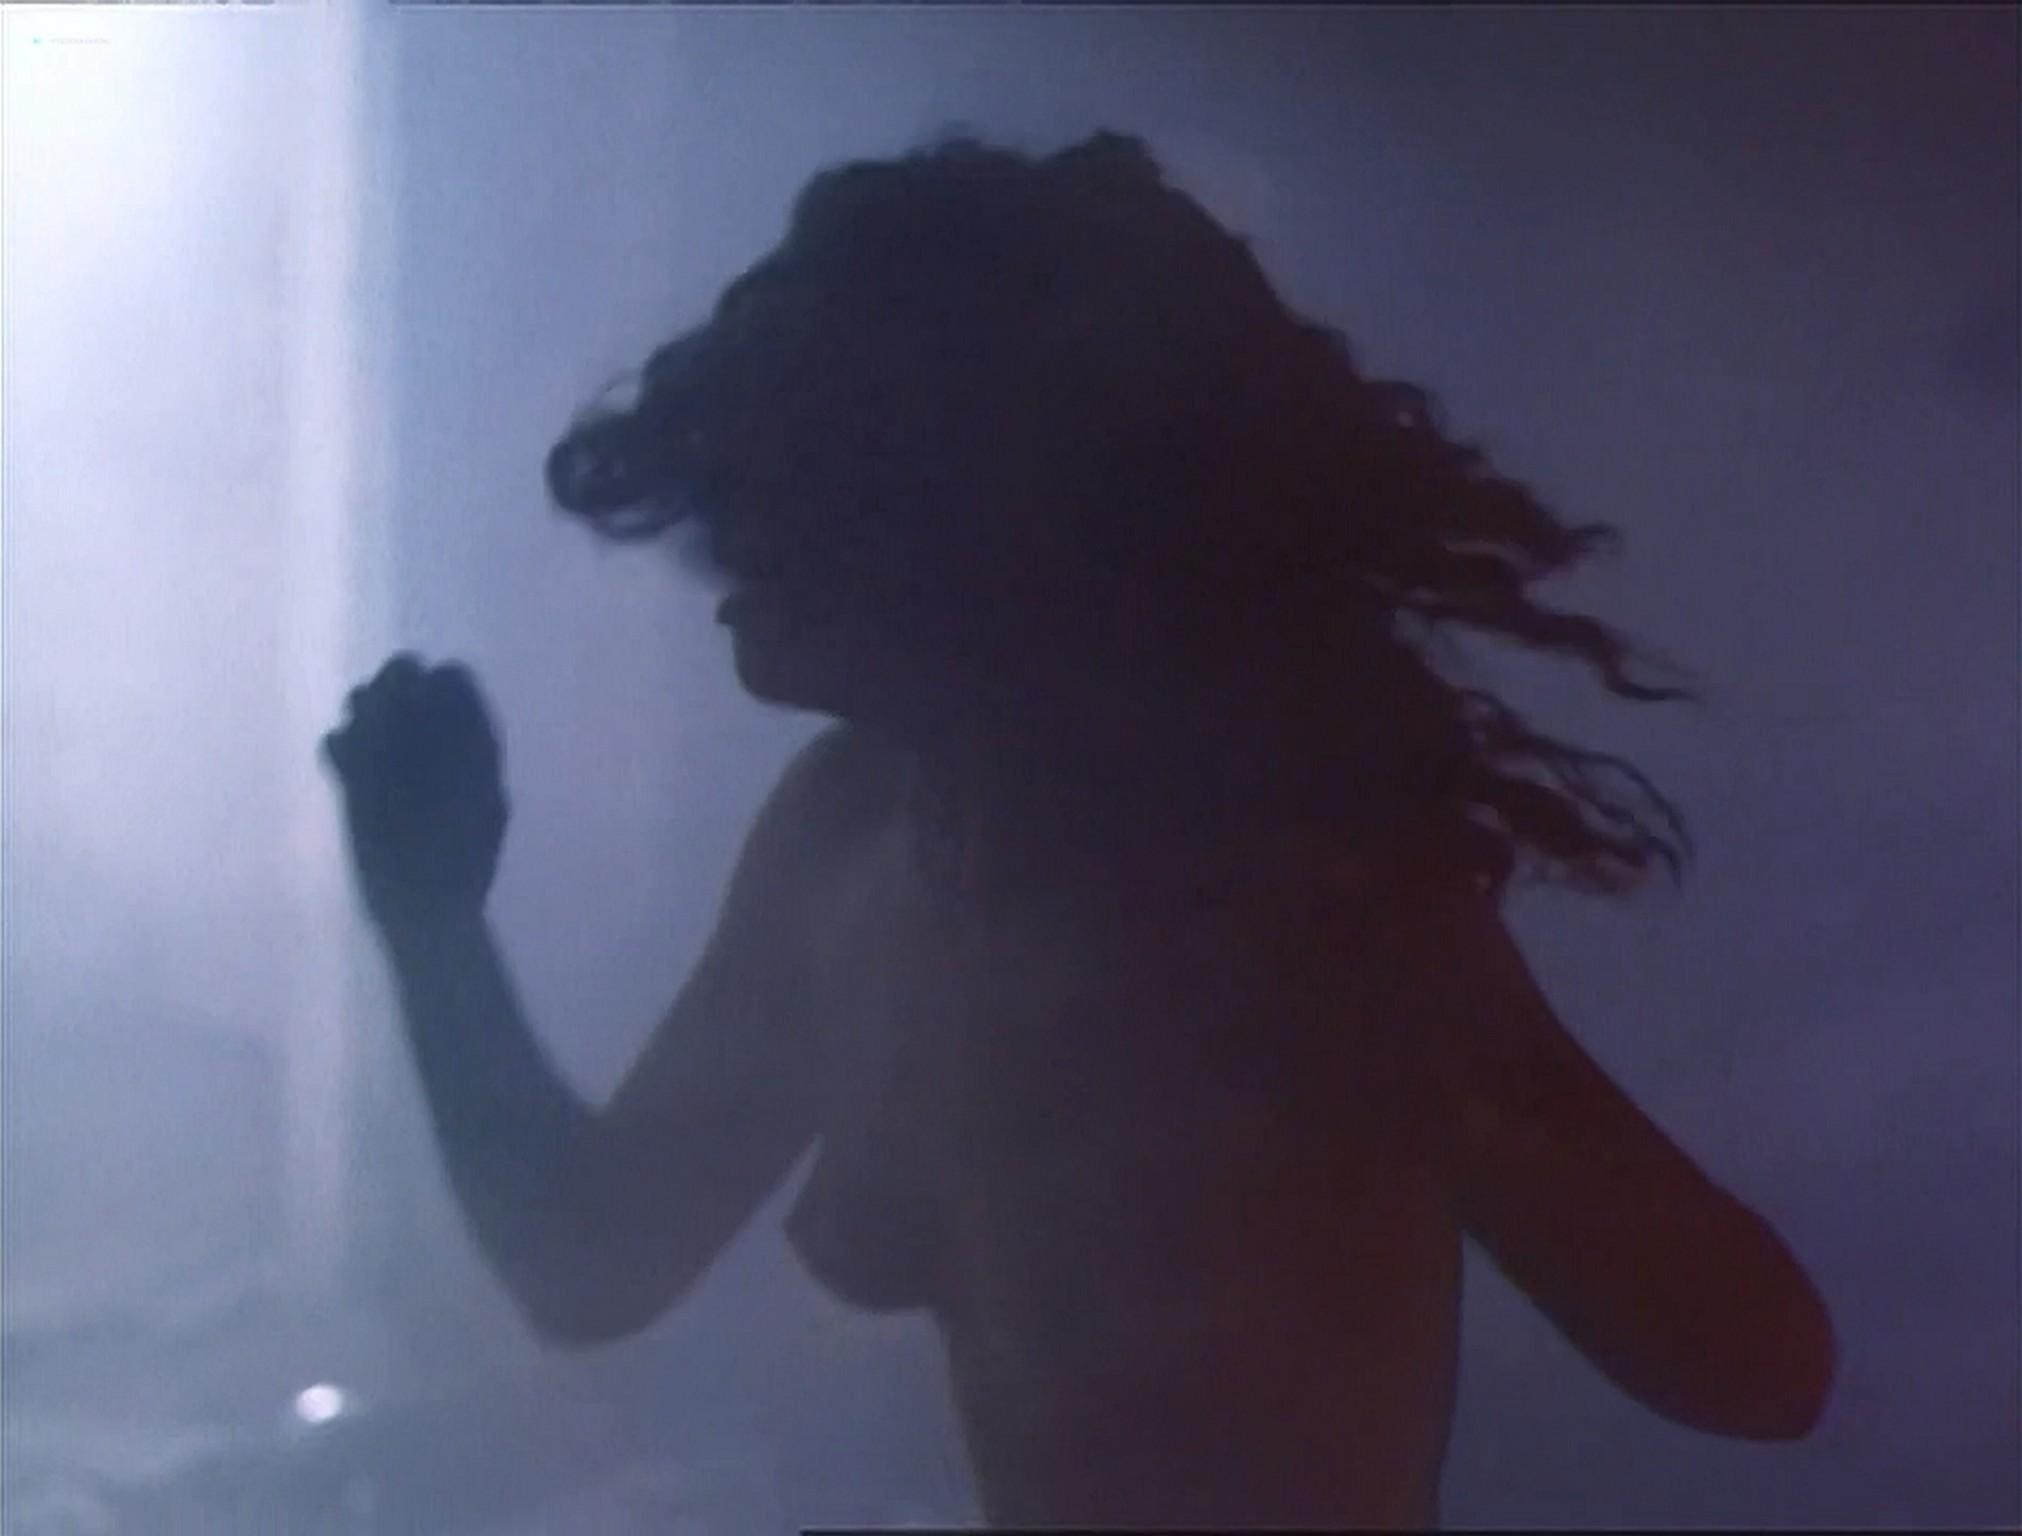 Christina Cox nude bush lesbian sex with Karyn Dwyer nude too Better than Chocolate 1999 HD 720p WEB DL 17